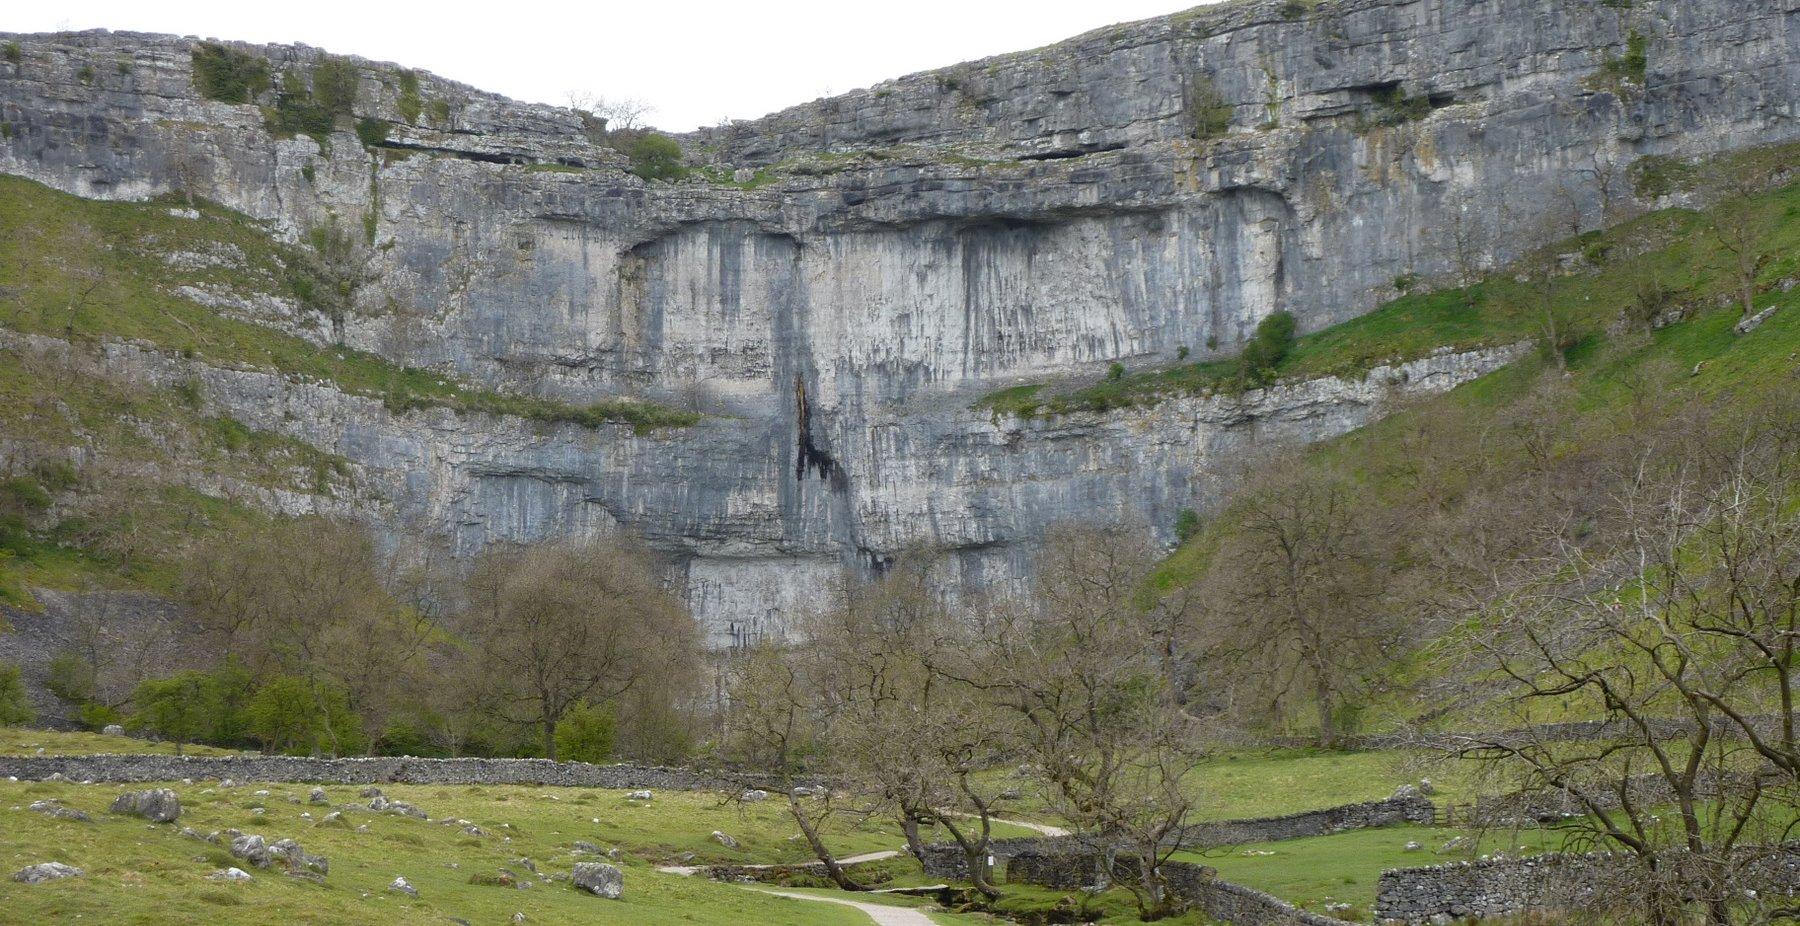 Malham Cove - seriously impressive limestone amphitheatre